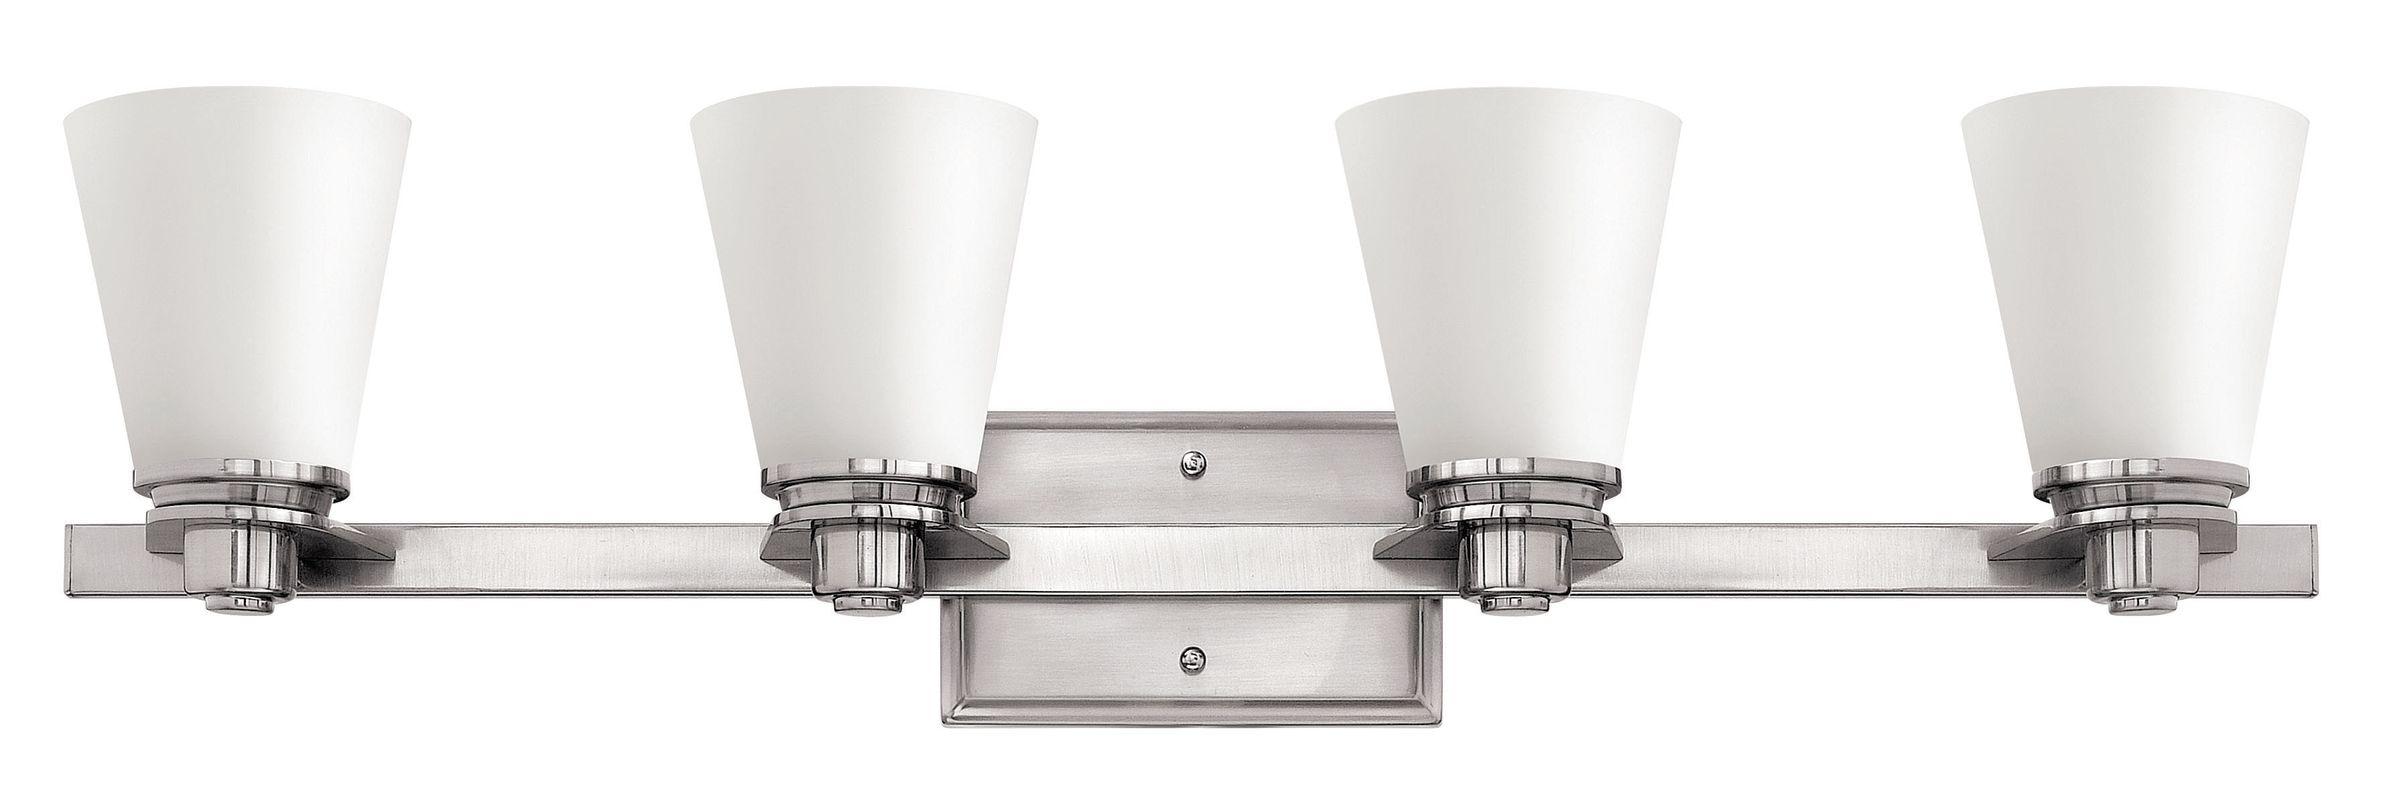 Shop Progress Lighting 4 Light Calven Brushed Nickel: Hinkley Lighting 5554BN-GU24 Brushed Nickel 4 Light Title